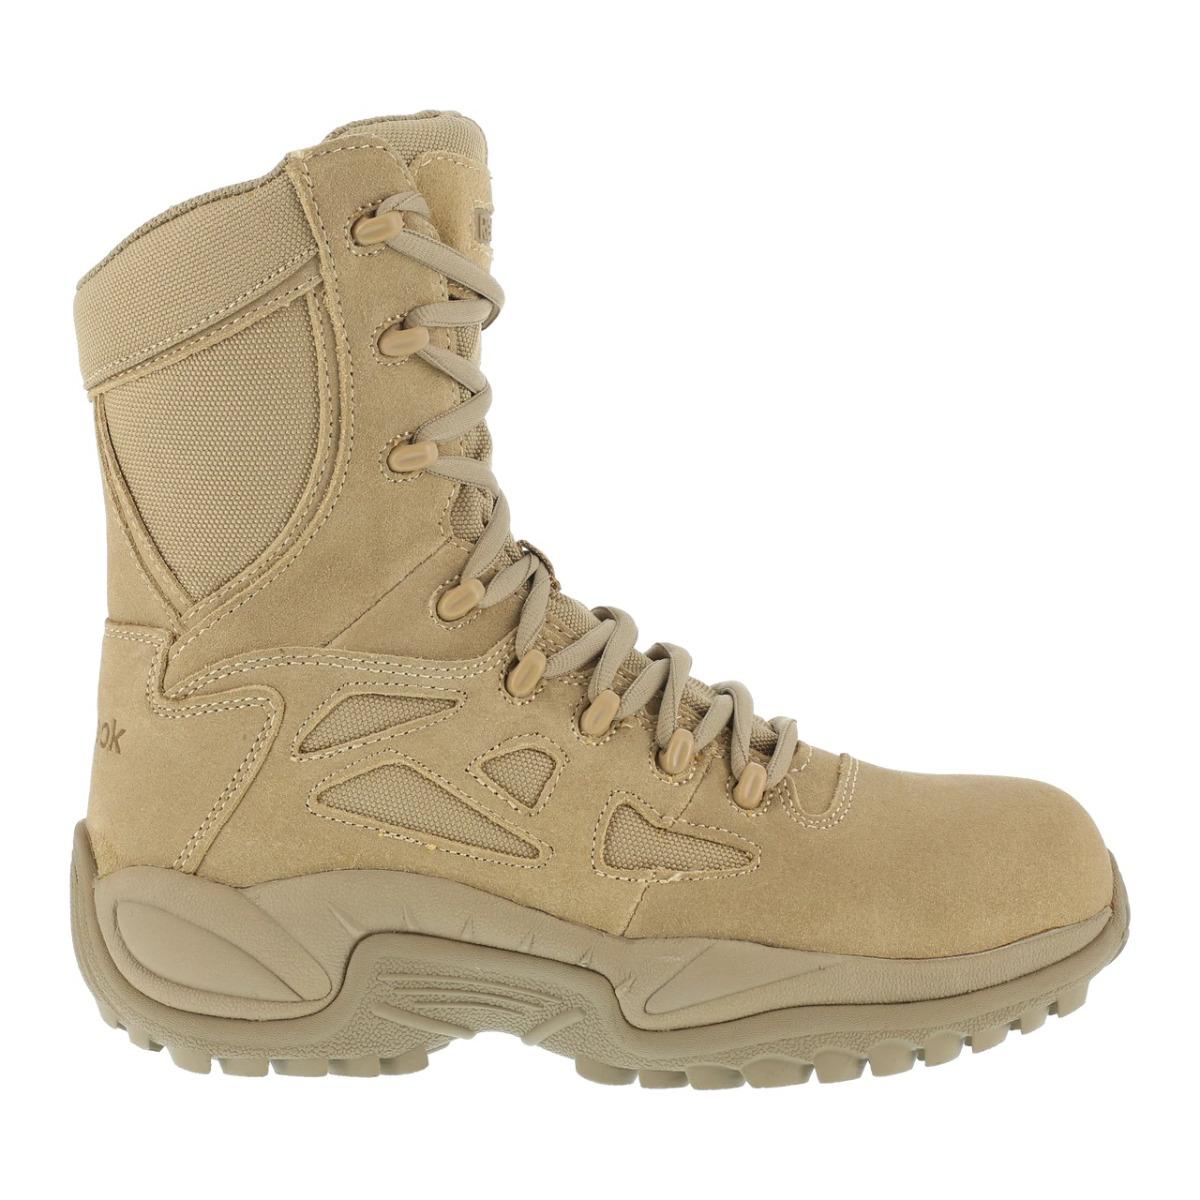 "Reebok Rapid Response Men's 8"" Stealth Boot with Side Zipper - Desert Tan"